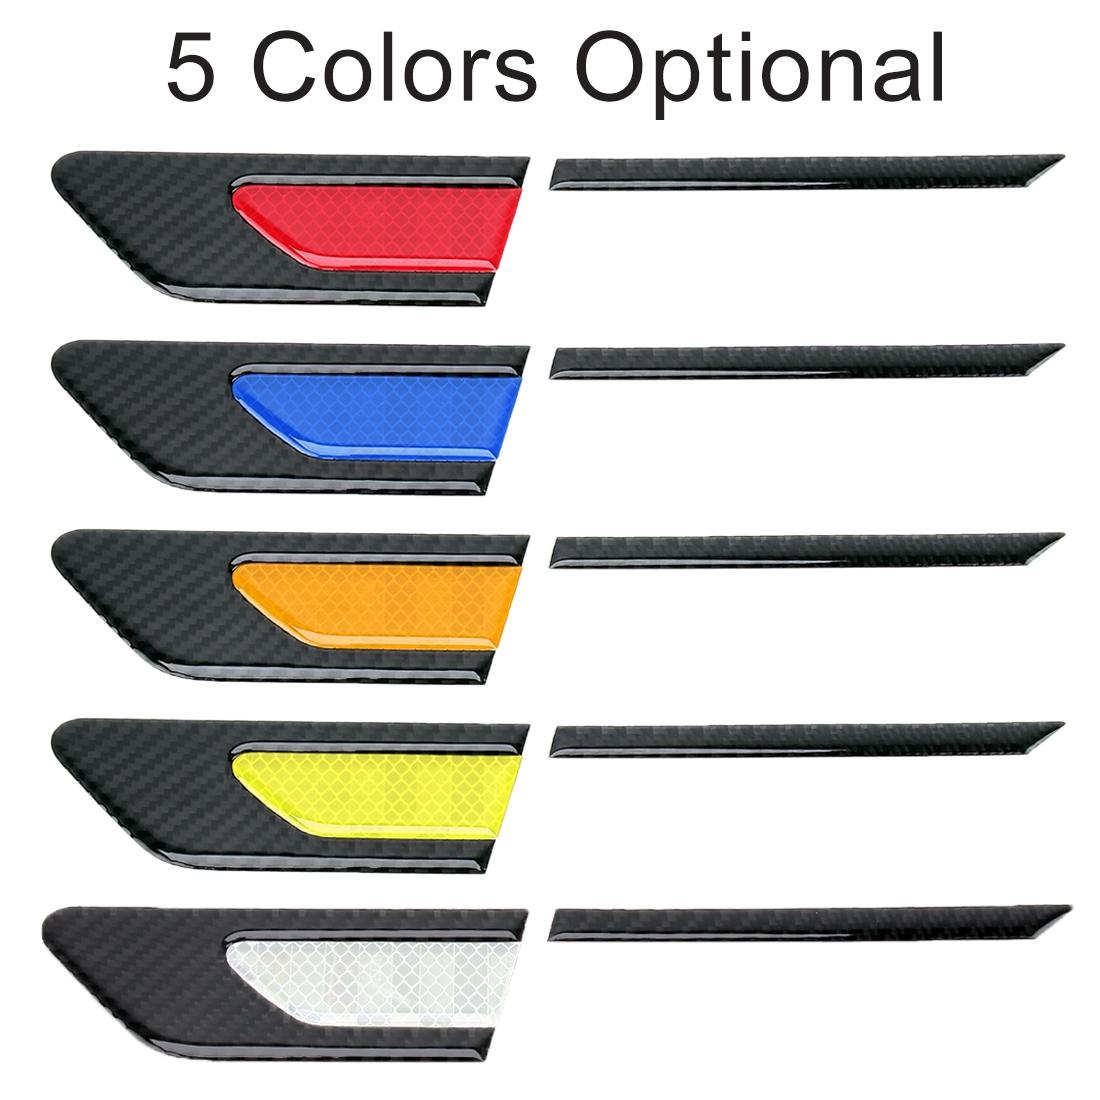 2 PCS Carbon Fiber Car-Styling Fender Reflective Bumper Decorative Strip, Inner Reflection + External Carbon Fiber (Blue)